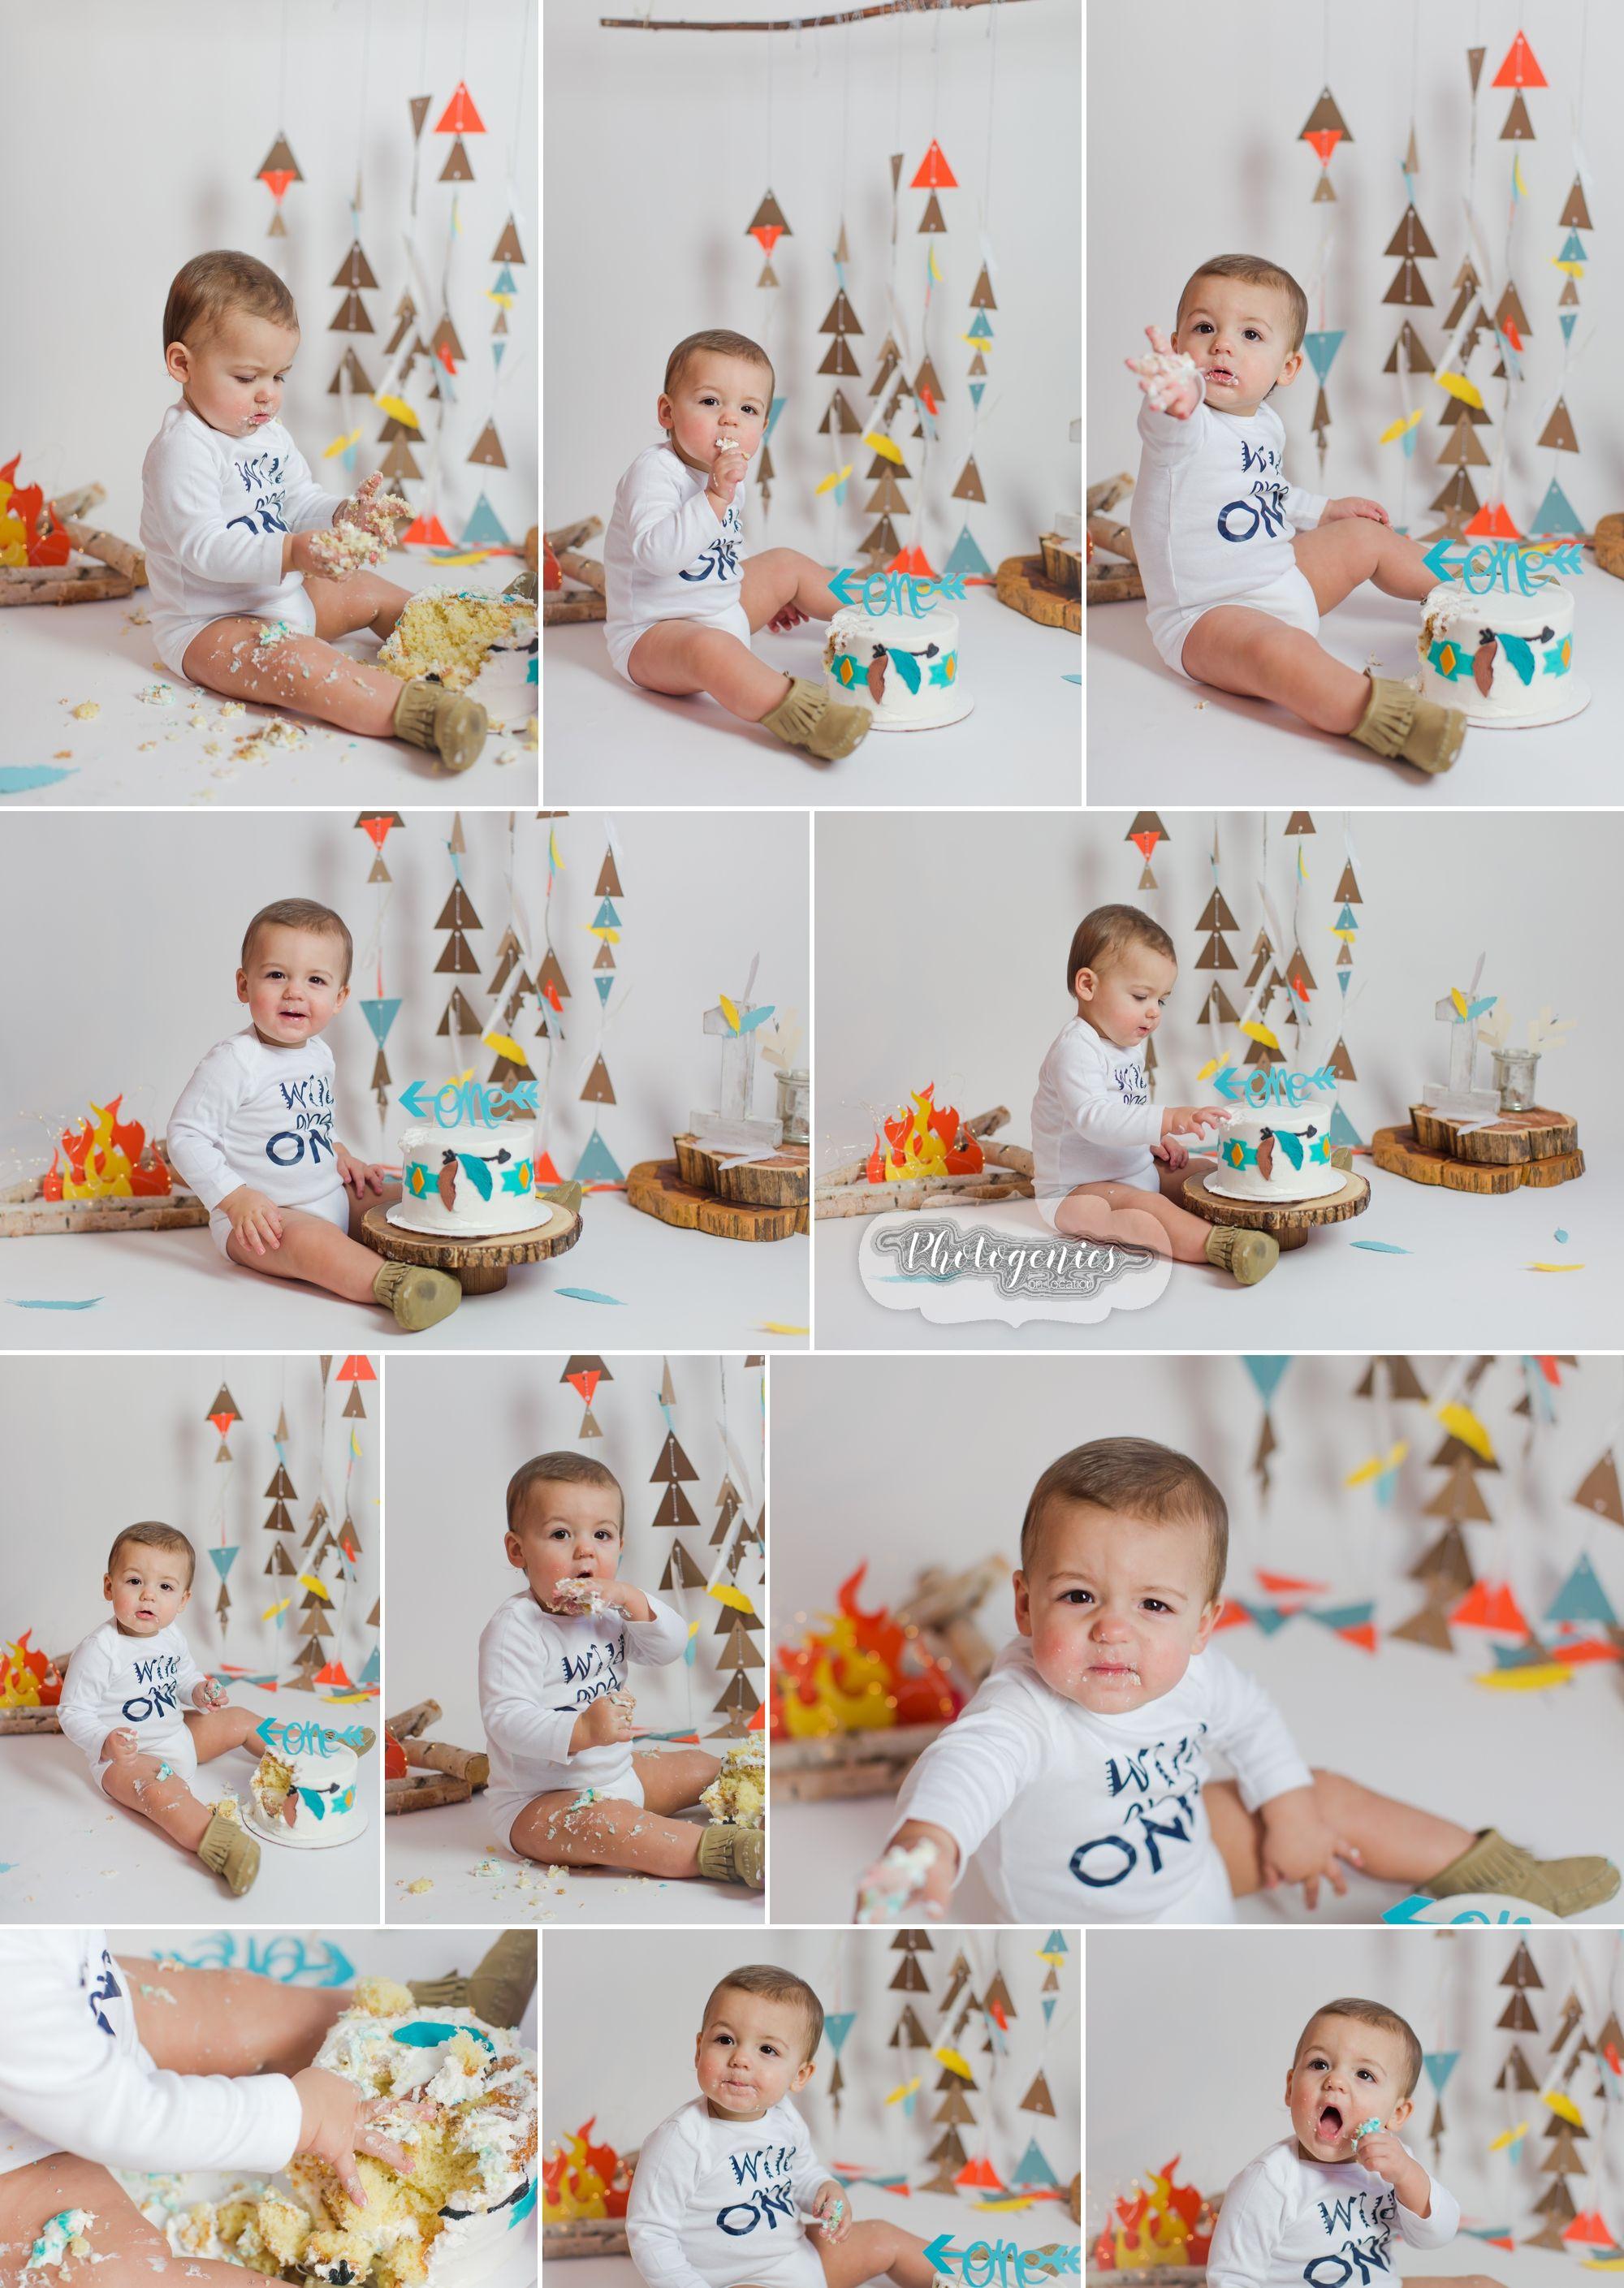 Joe S Birthday Session Tribal Cake Smash St Louis Washington Mo Photographer Smash Cake Boy Cake Smash Boys First Birthday Party Ideas